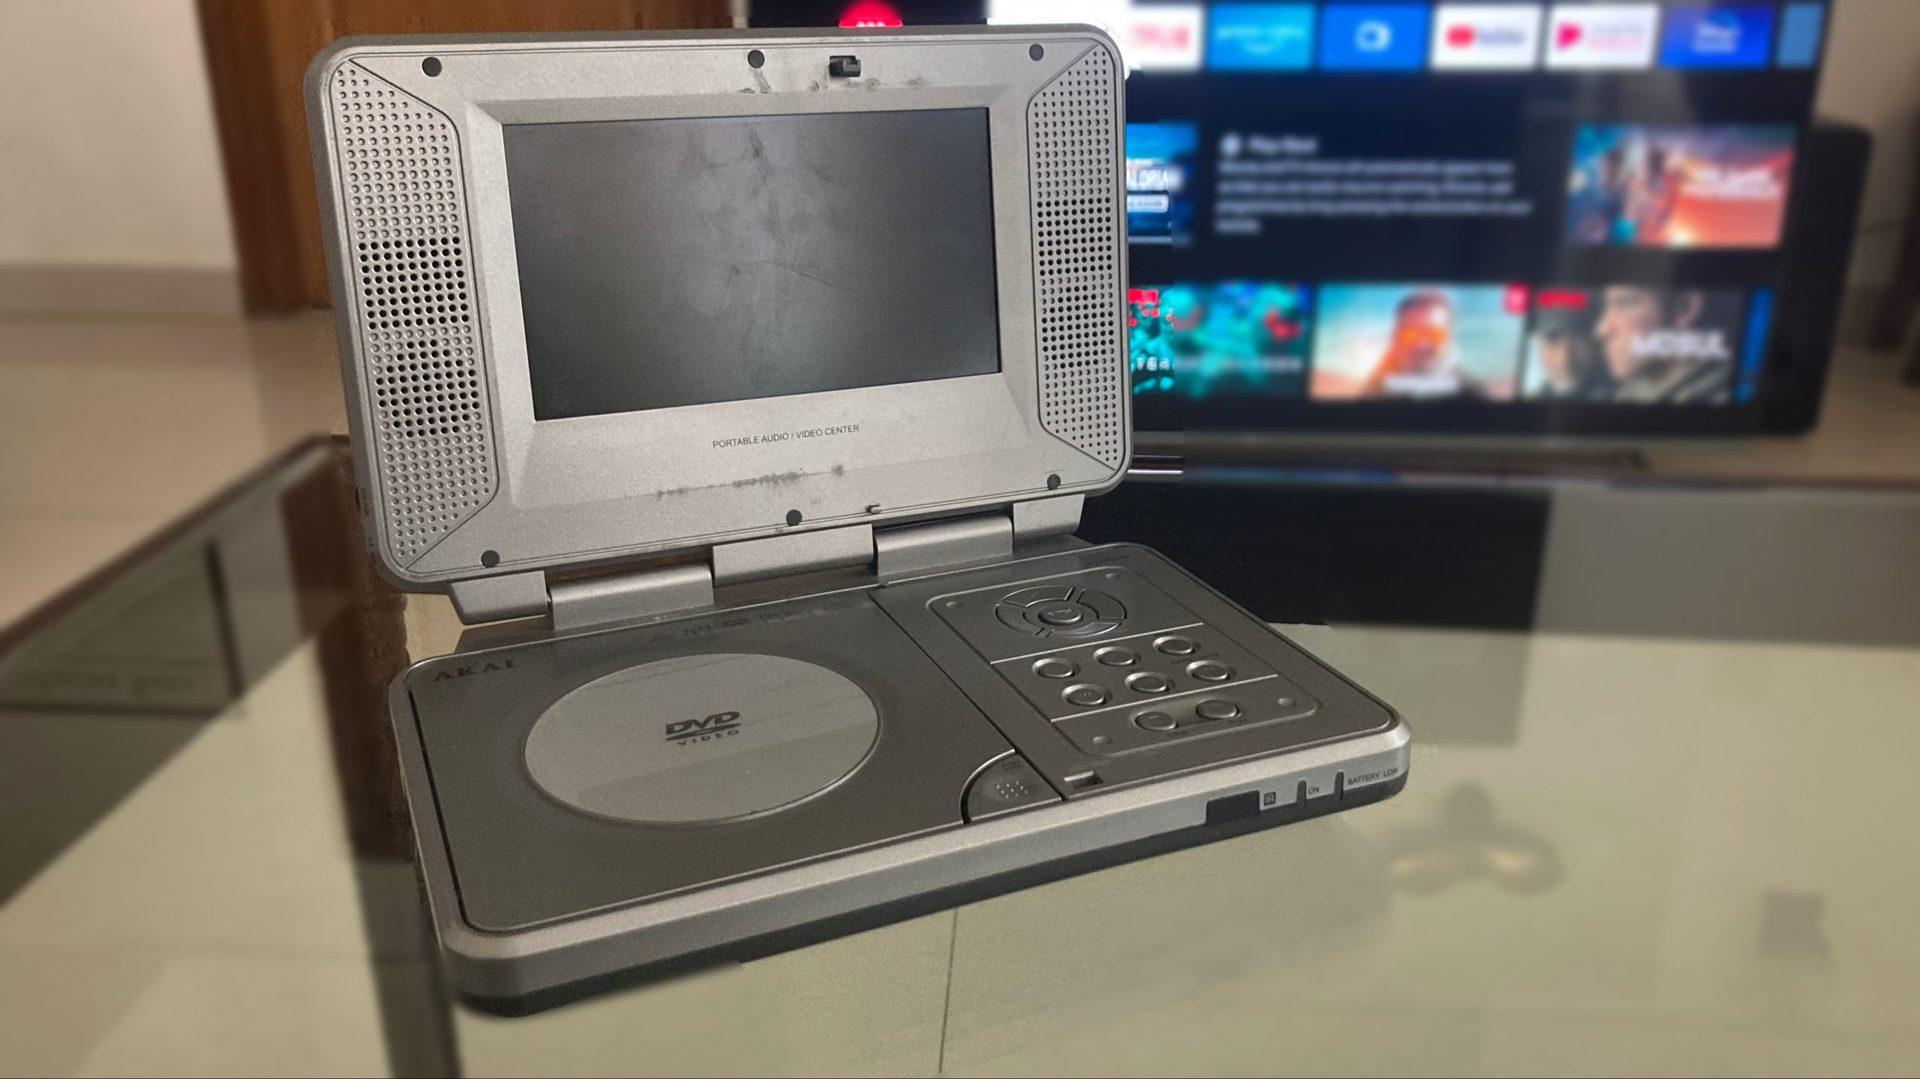 Akai portable video player 1